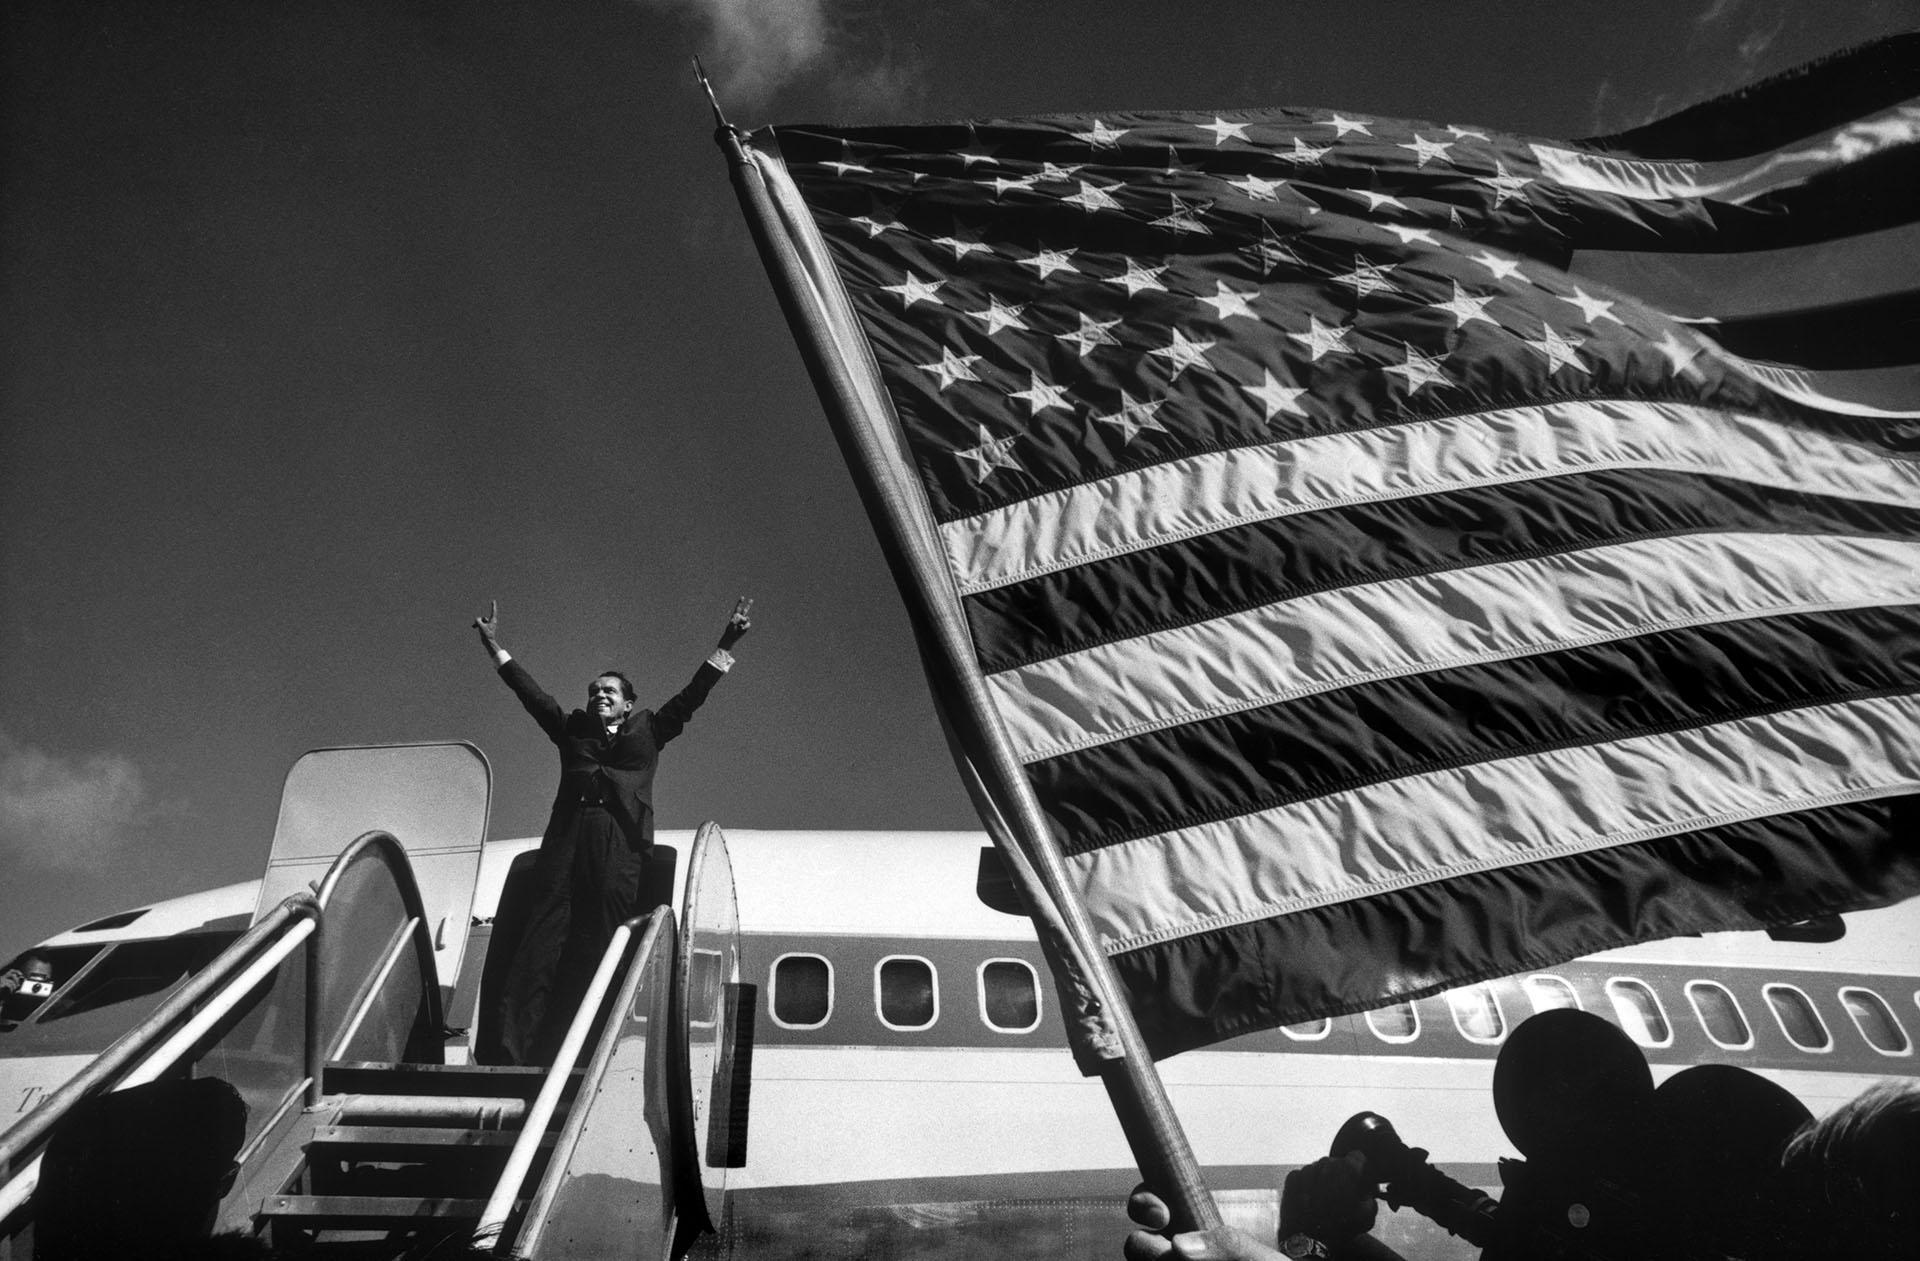 Republican candidate Richard Nixon campaigning for Presidency in Iowa, October 1968. (Credit: Raymond Depardon/Magnum Photos)